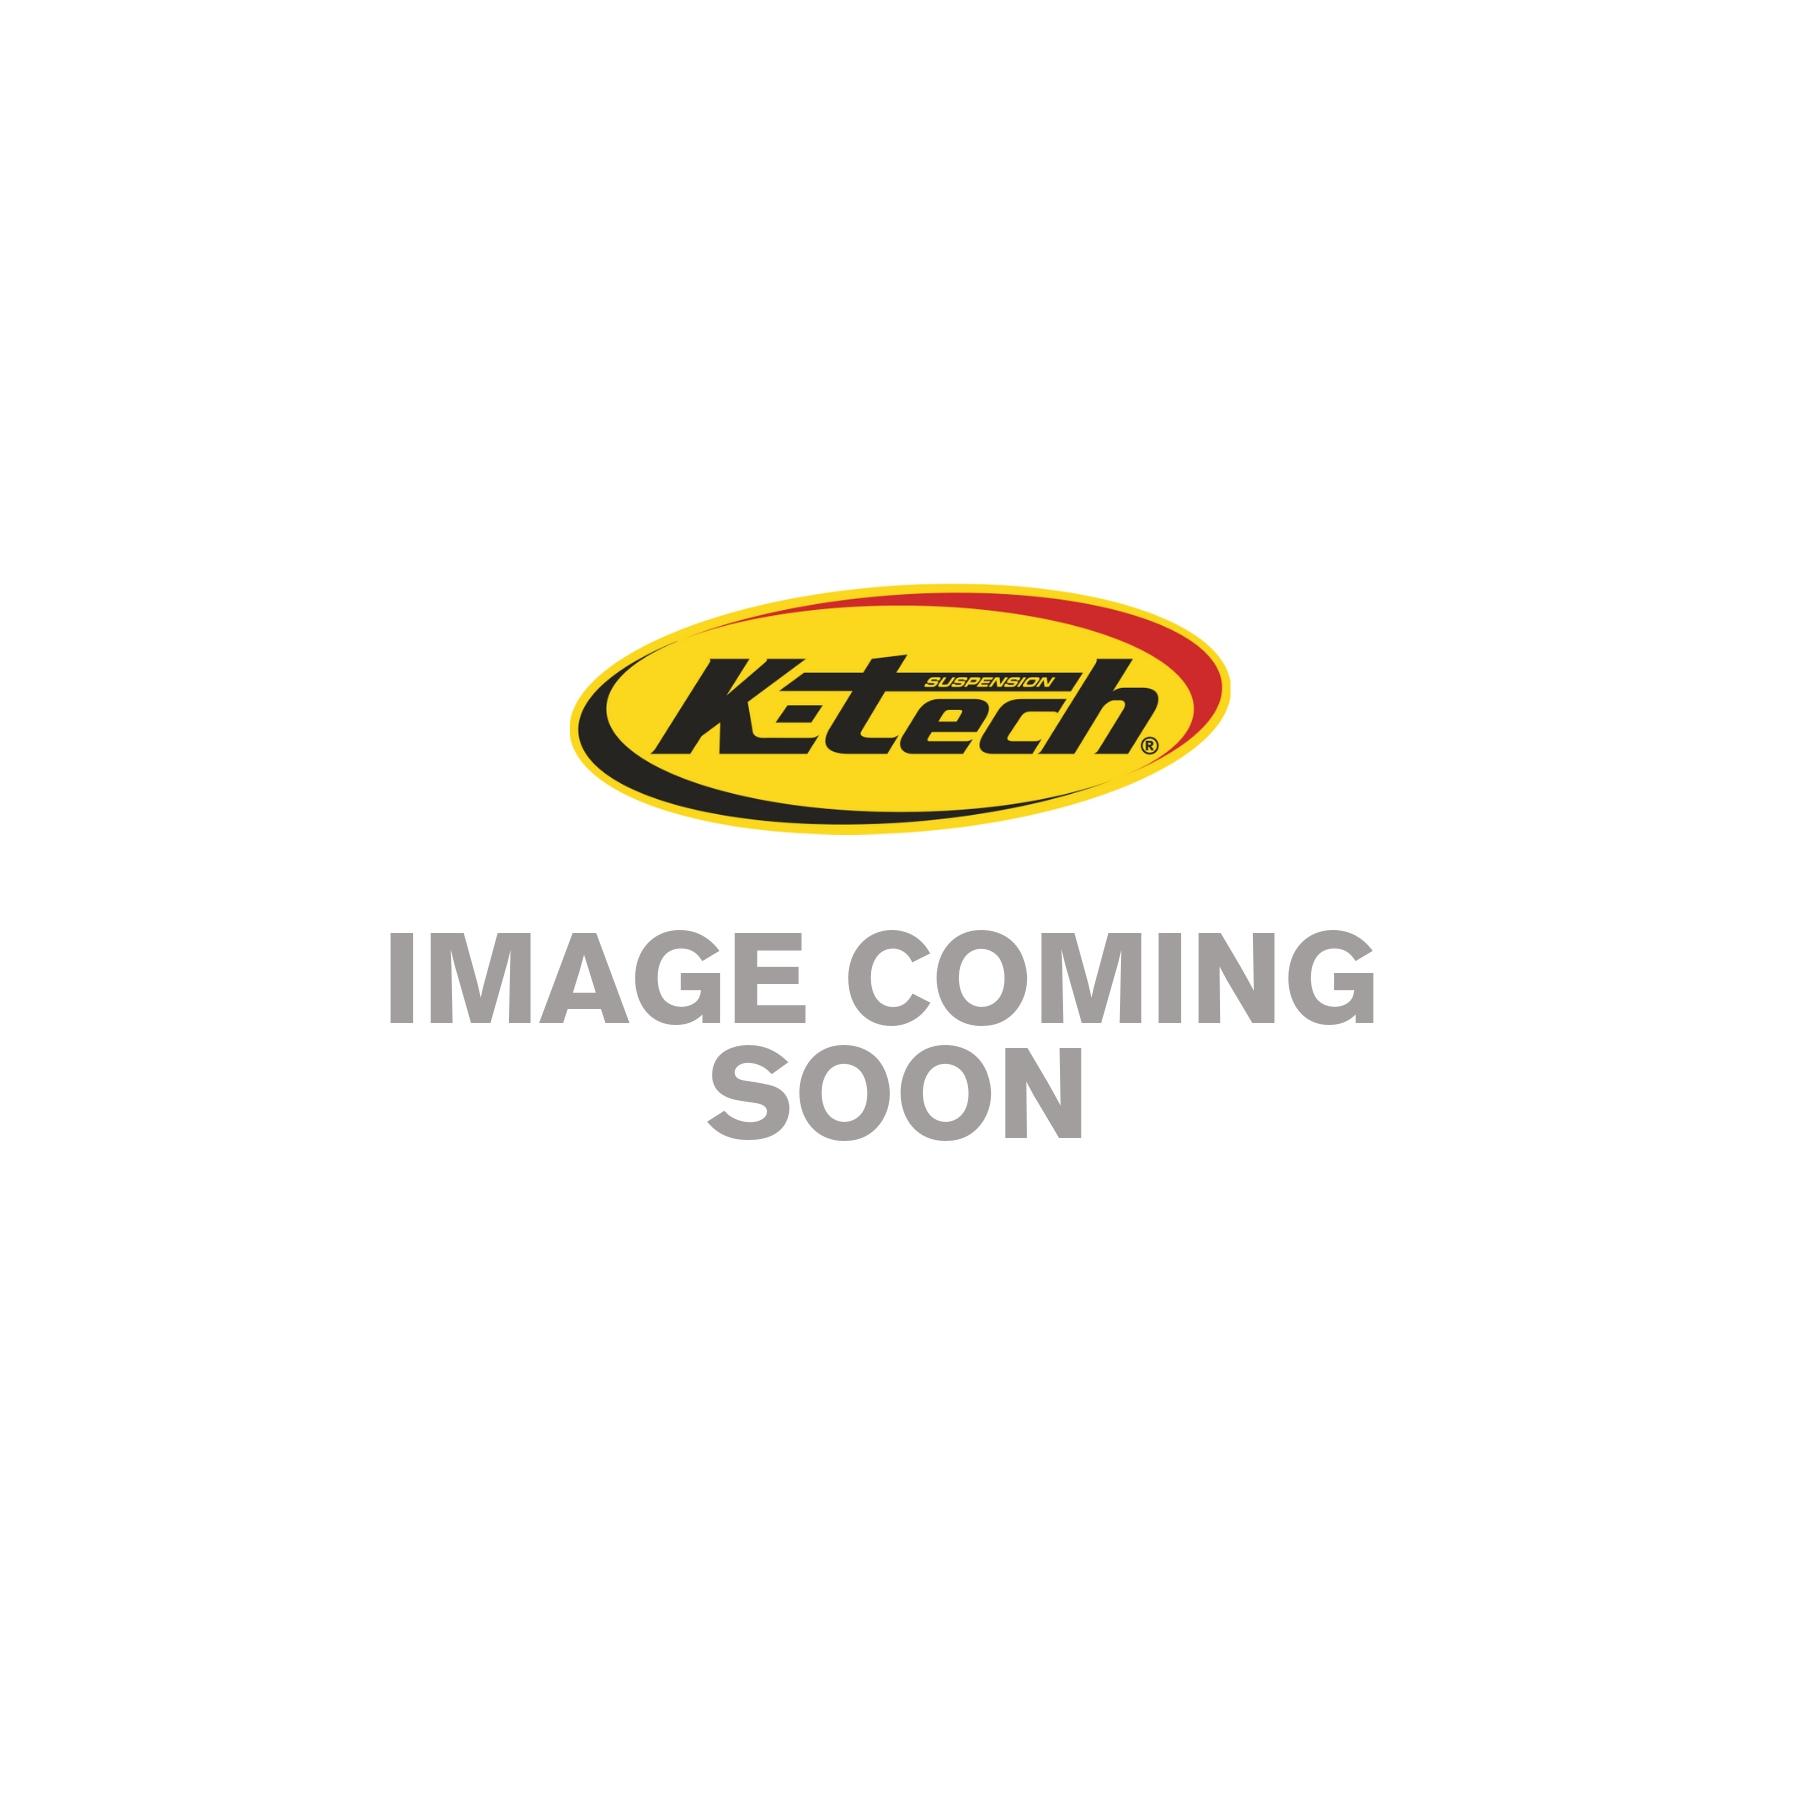 20IDS Front Fork Cartridges KTM 790 Duke 2018> WP